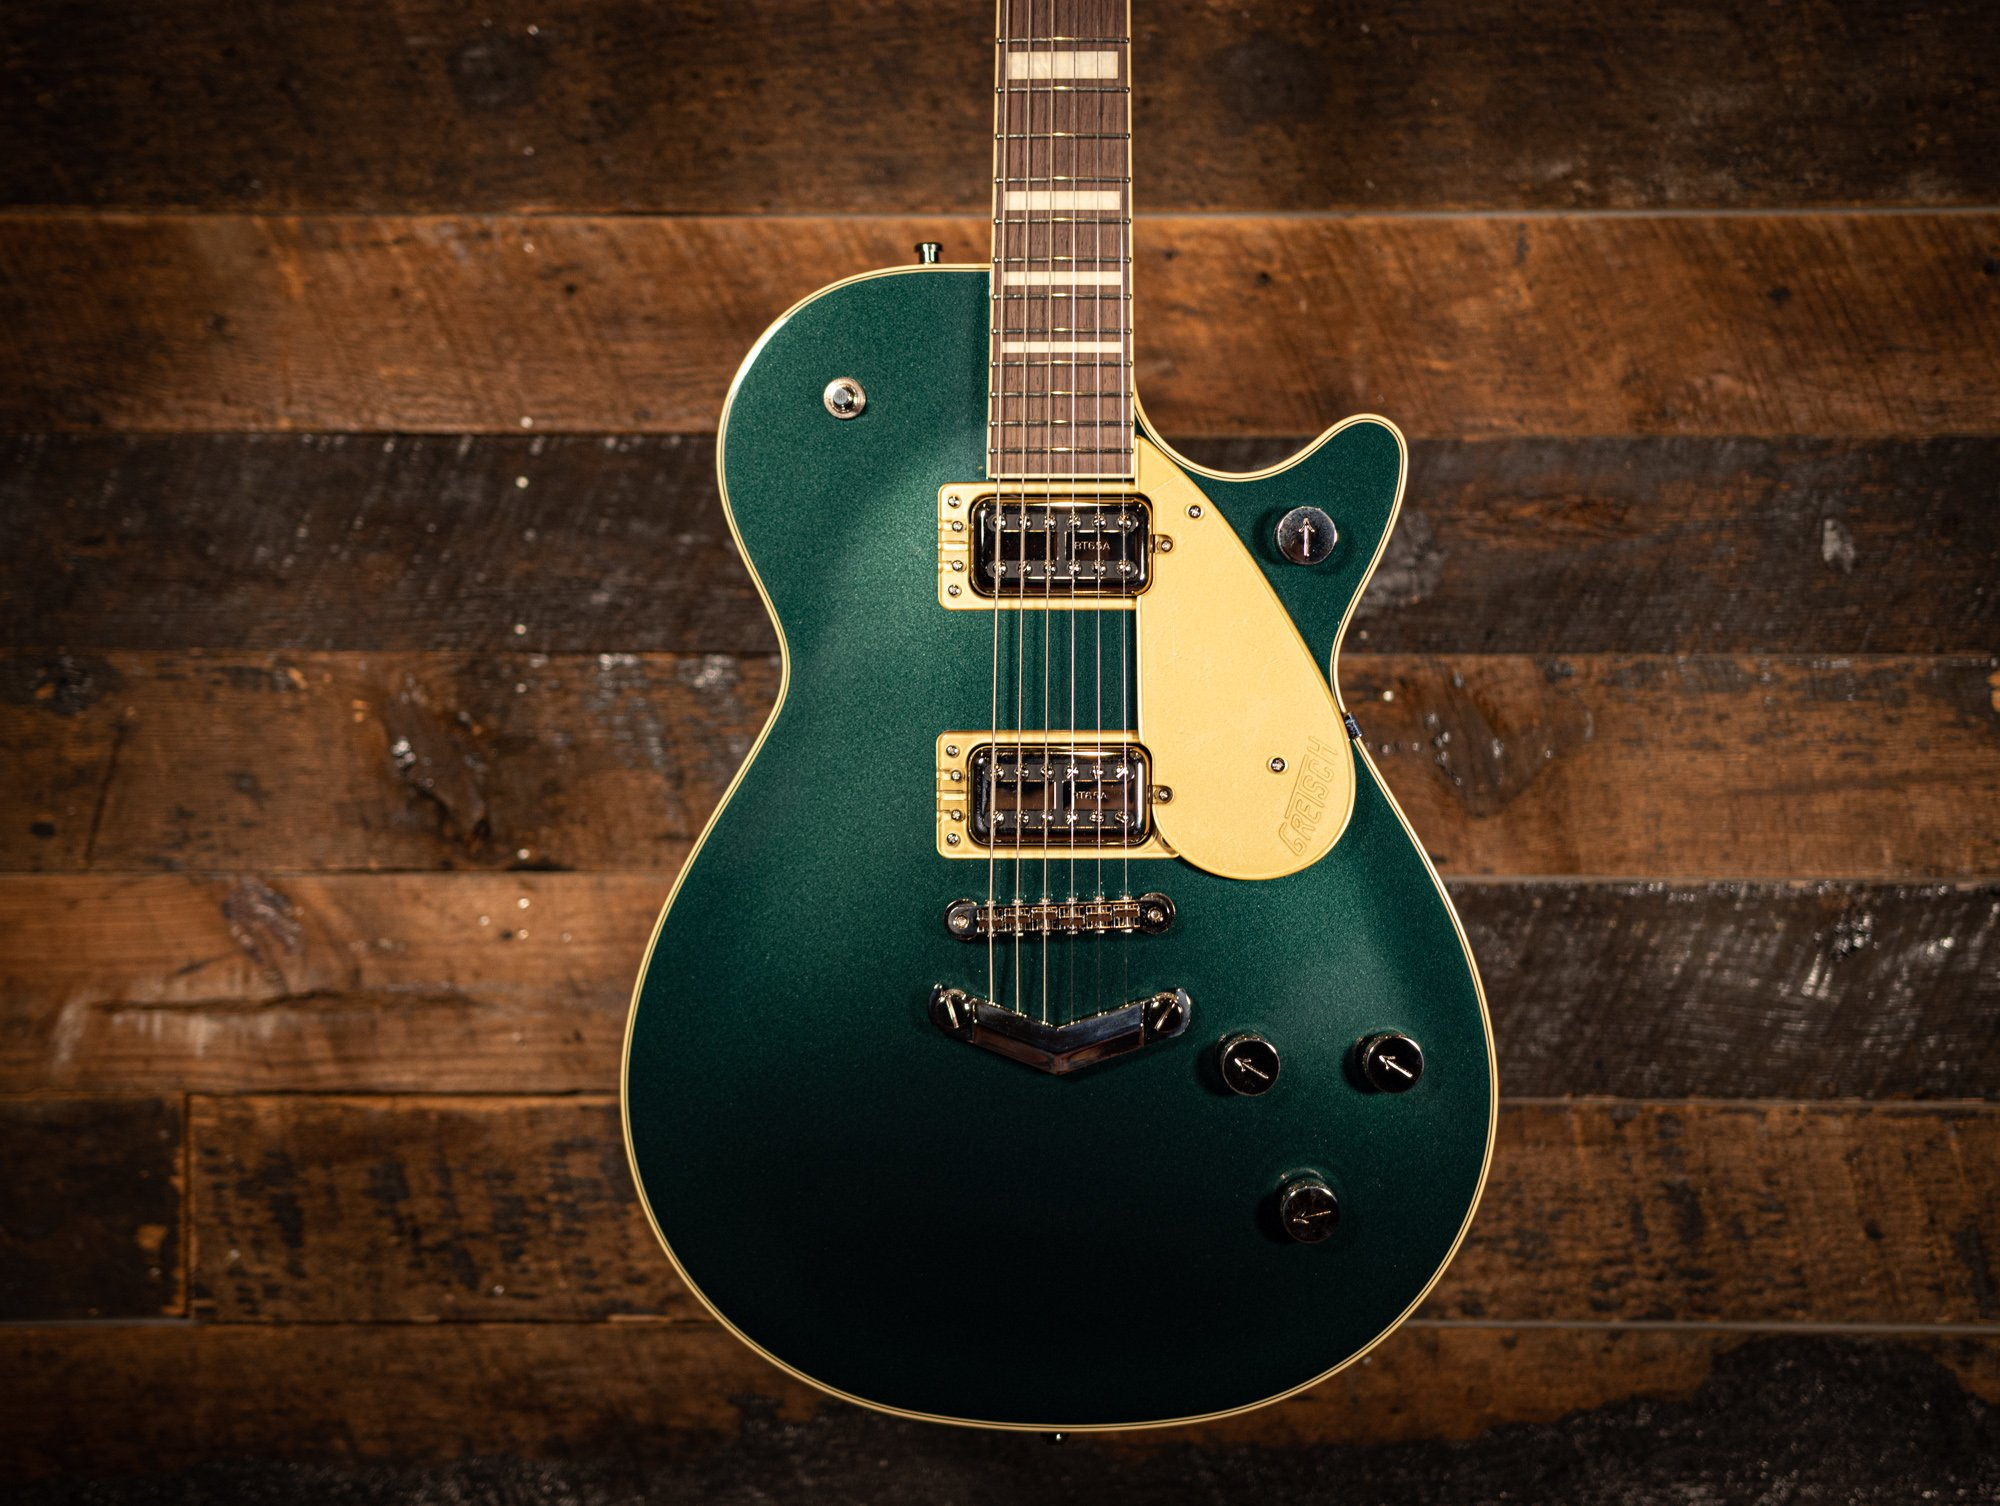 Gretsch G6228 Players Edition Cadillac Green